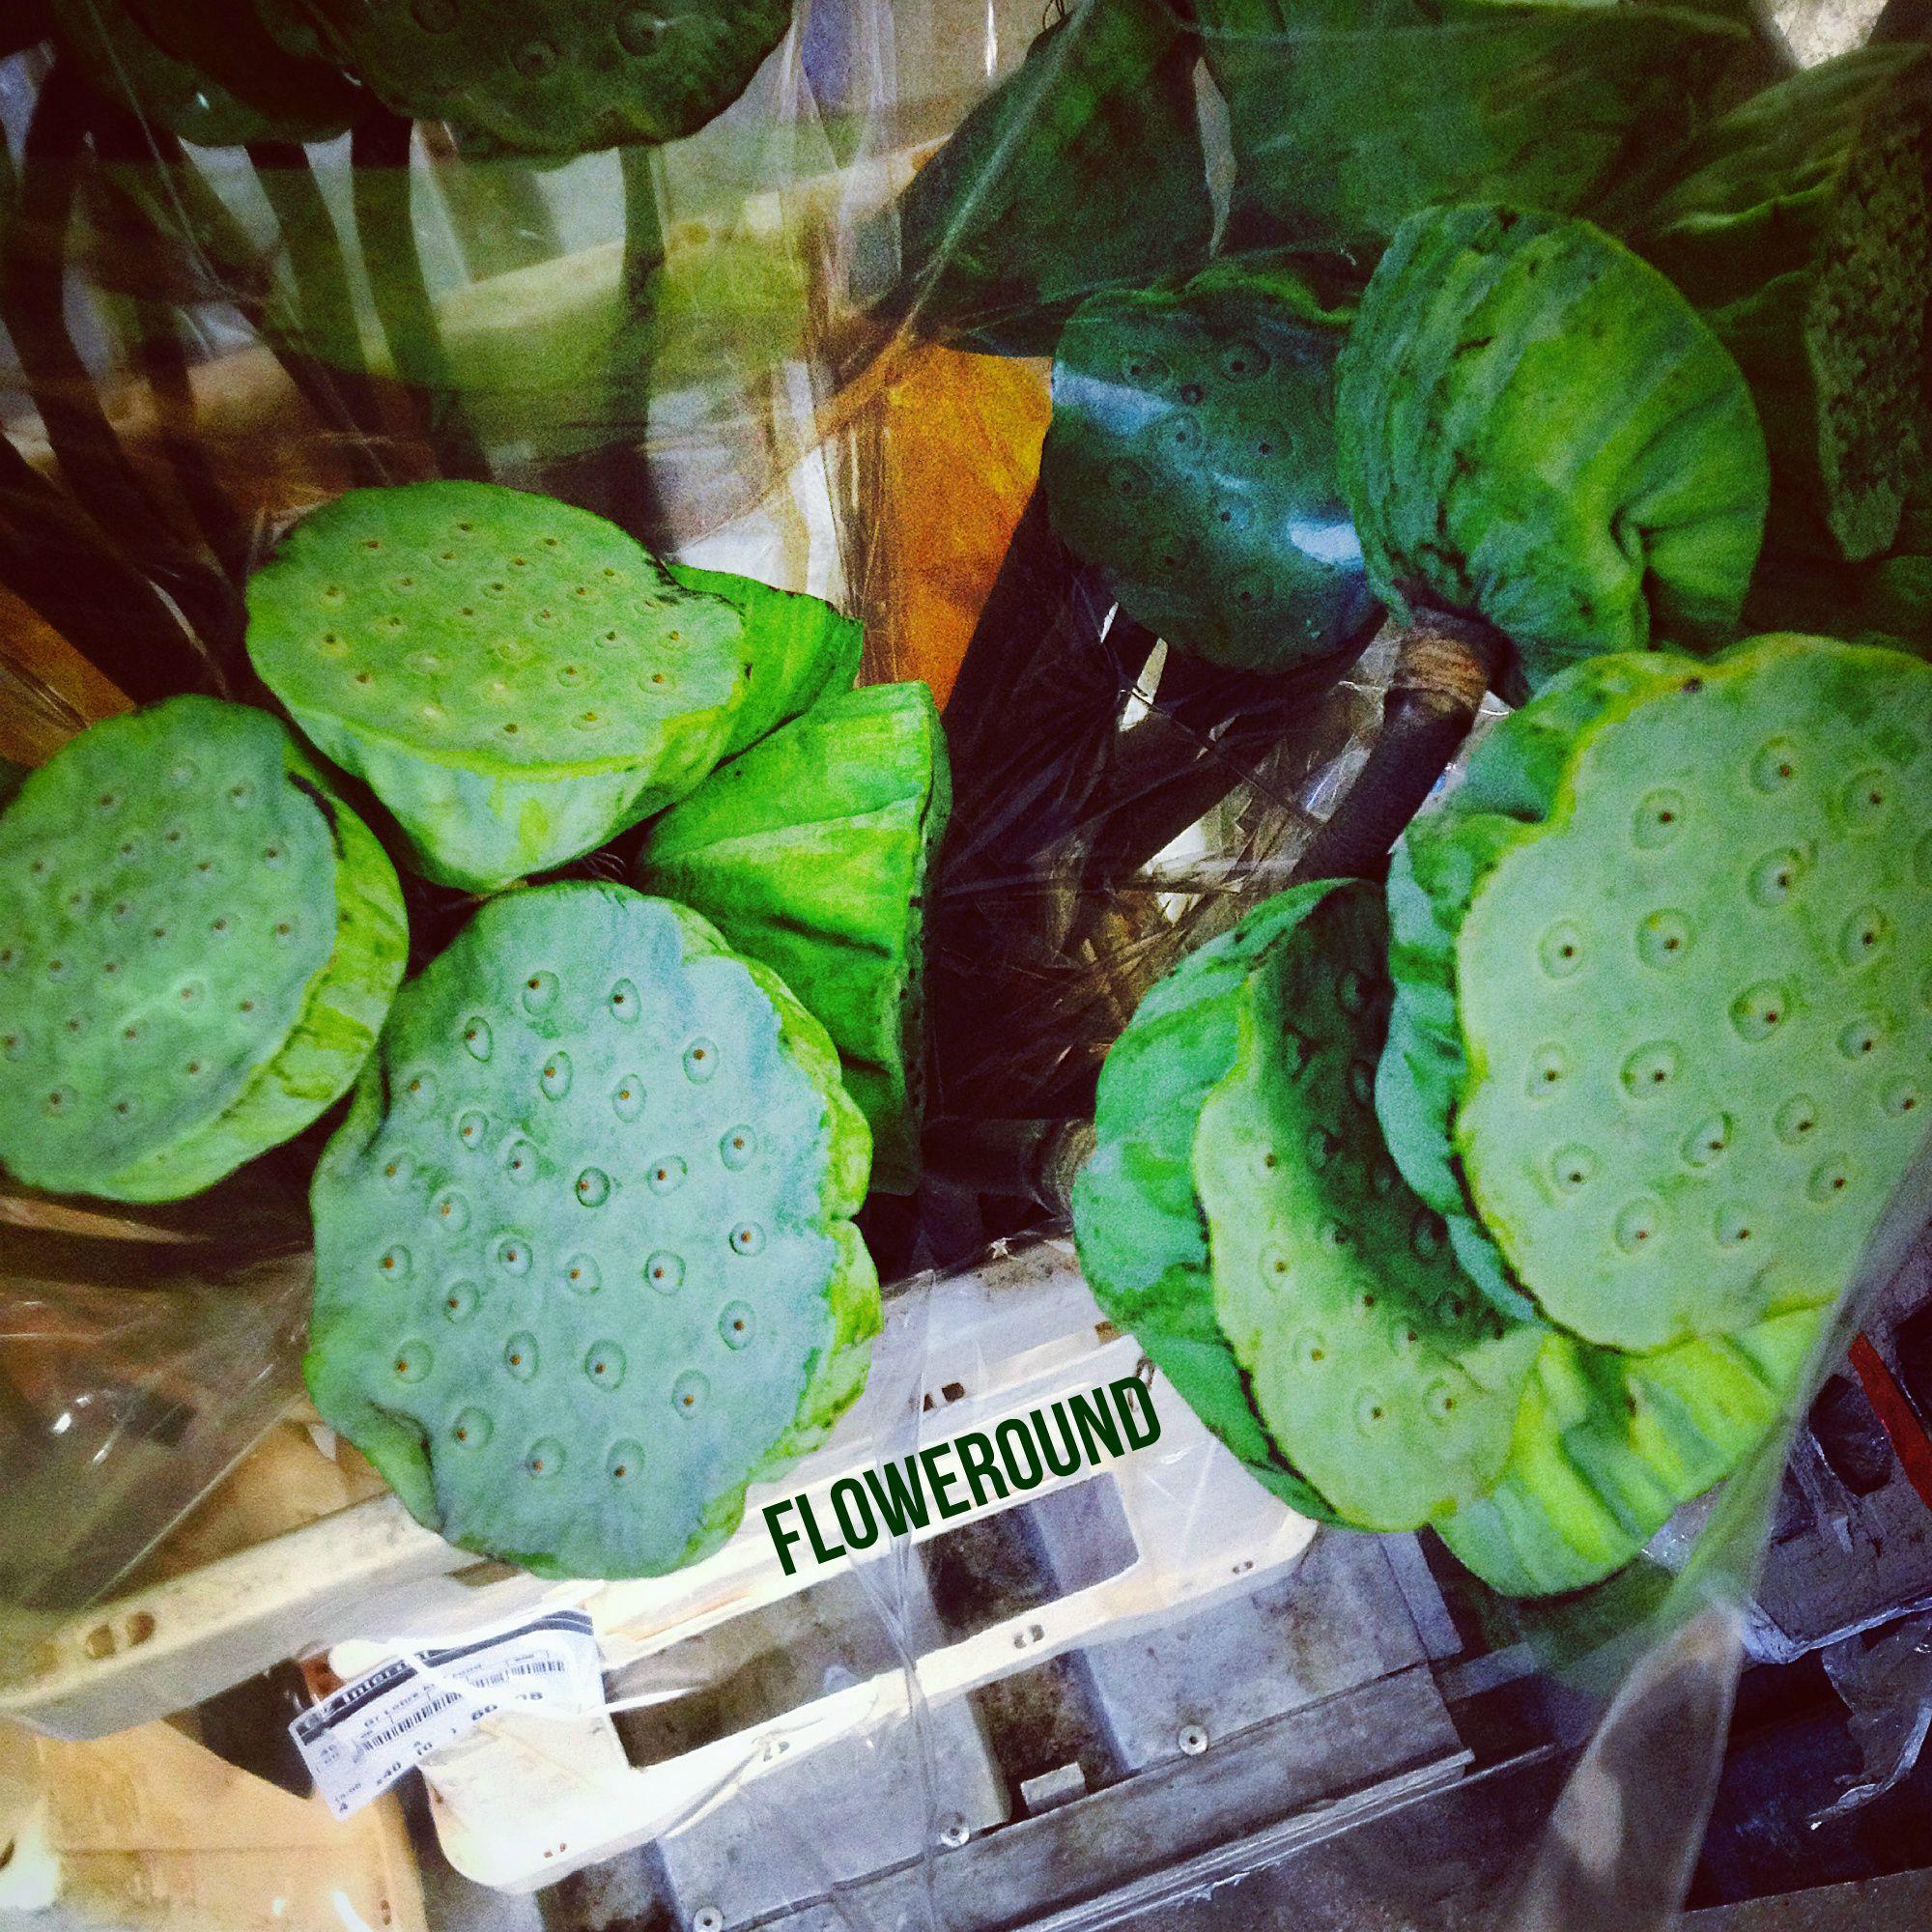 #lotus #cutflowers #green #nature